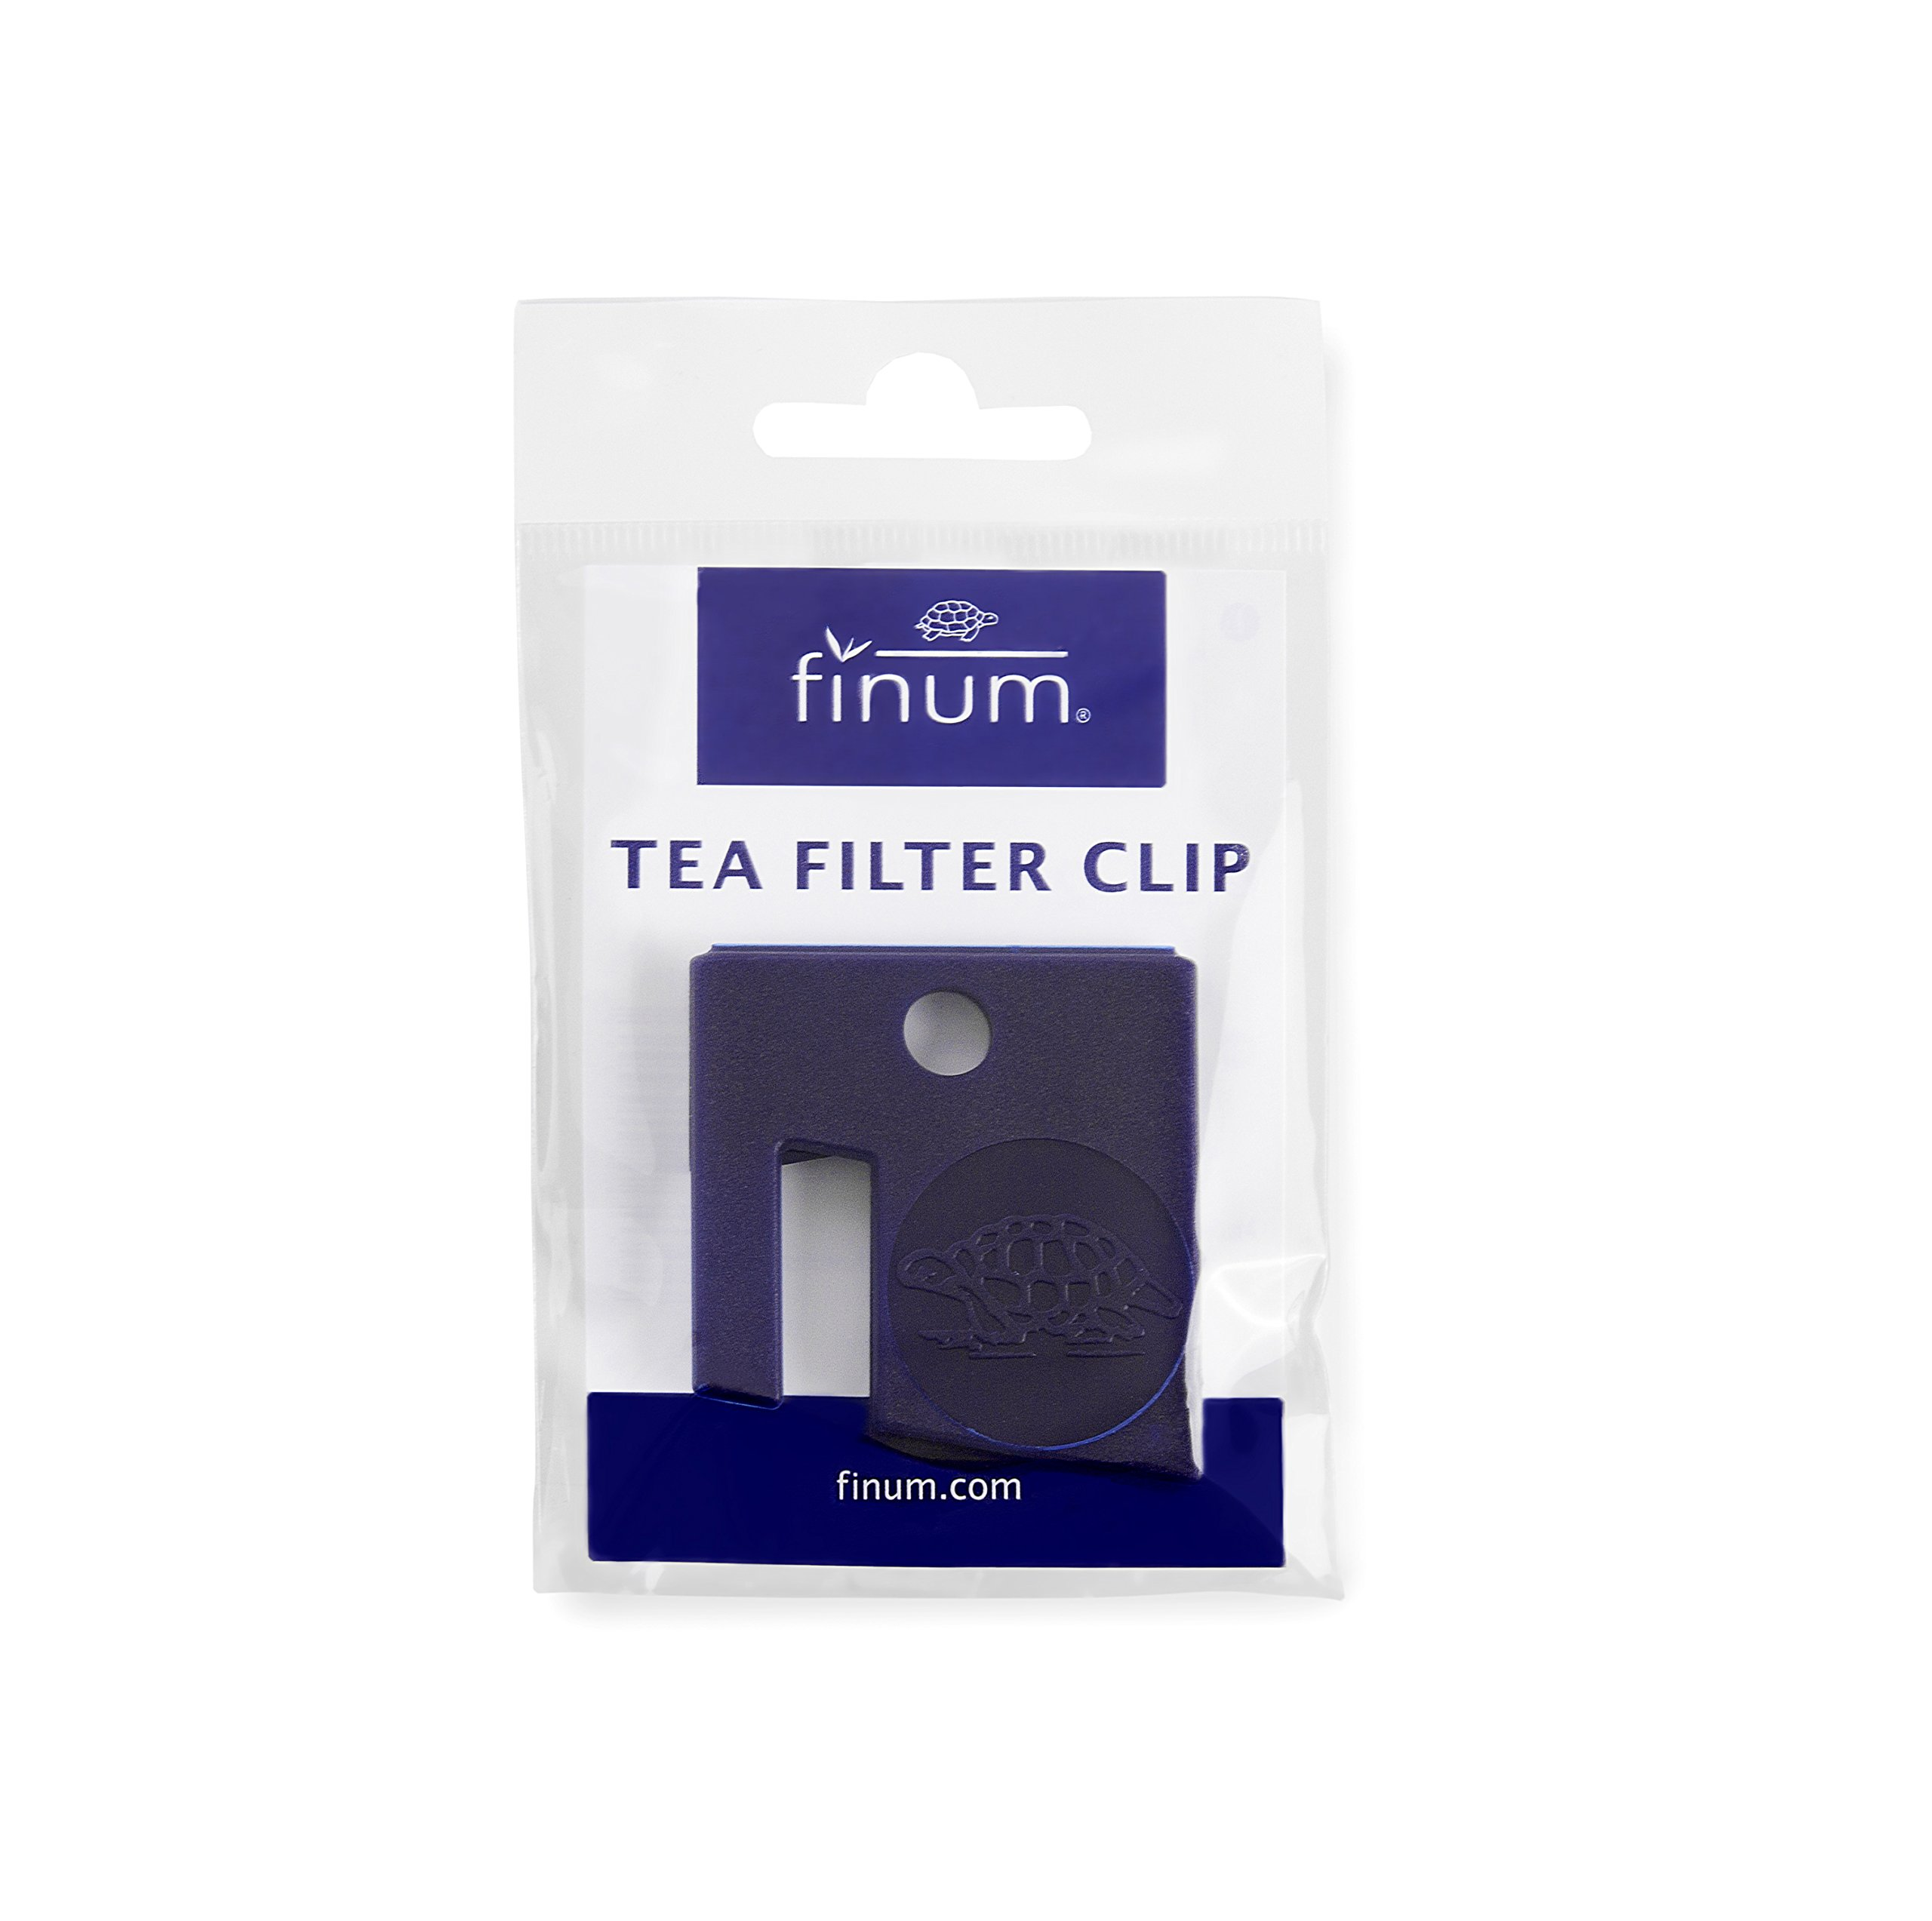 Tea Filter Clip (100 Retail Packages per case)